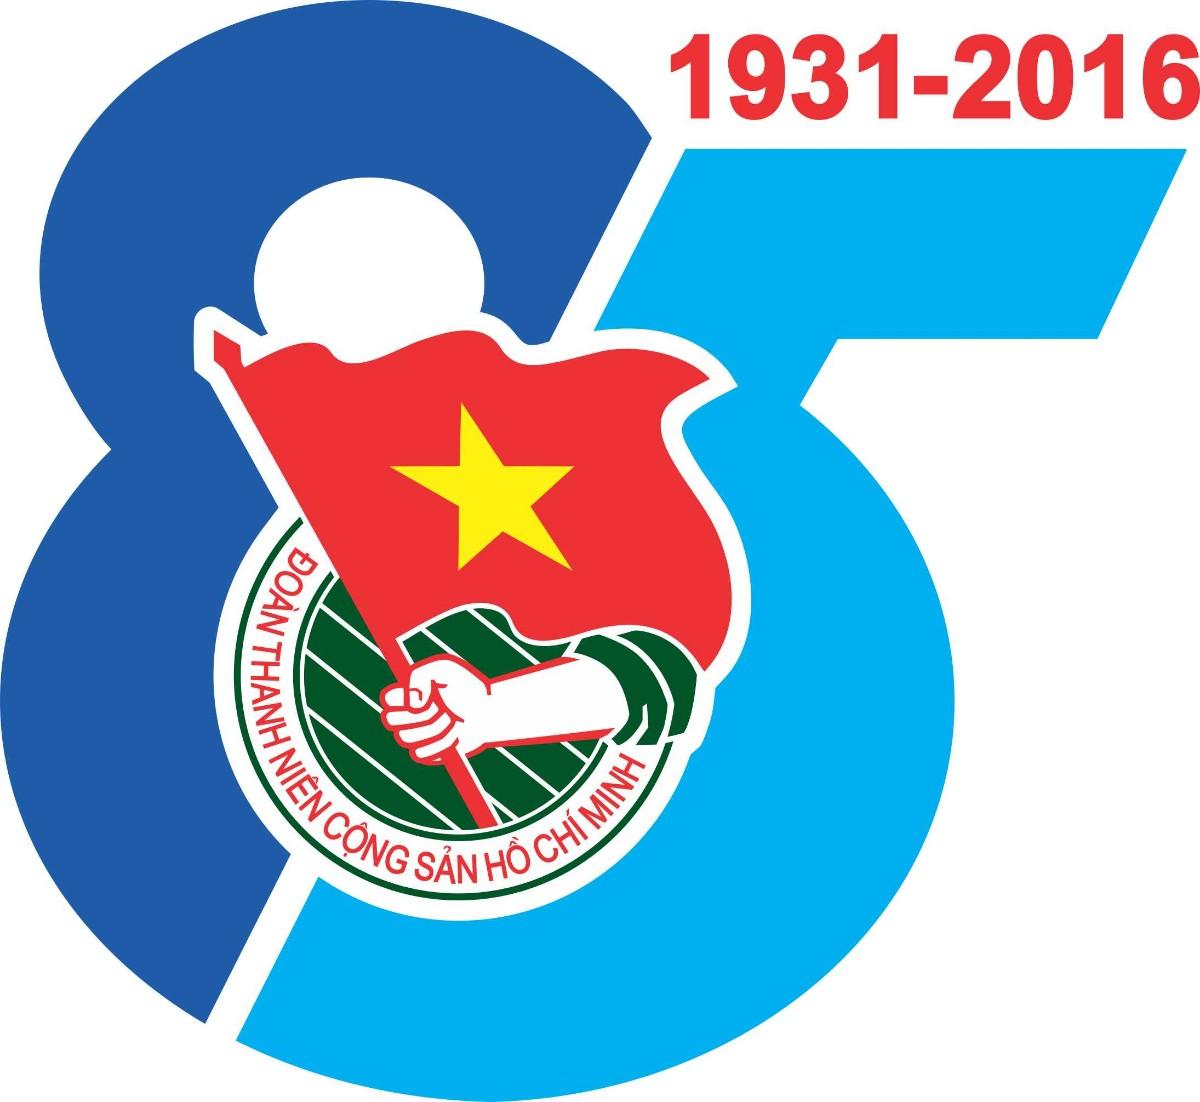 http://www.thanhdoan.hochiminhcity.gov.vn/ThanhDoan/webtd/Content/news/2016/3/24796/85%20nam%20-%20xuat%20mau%20RGB.jpg